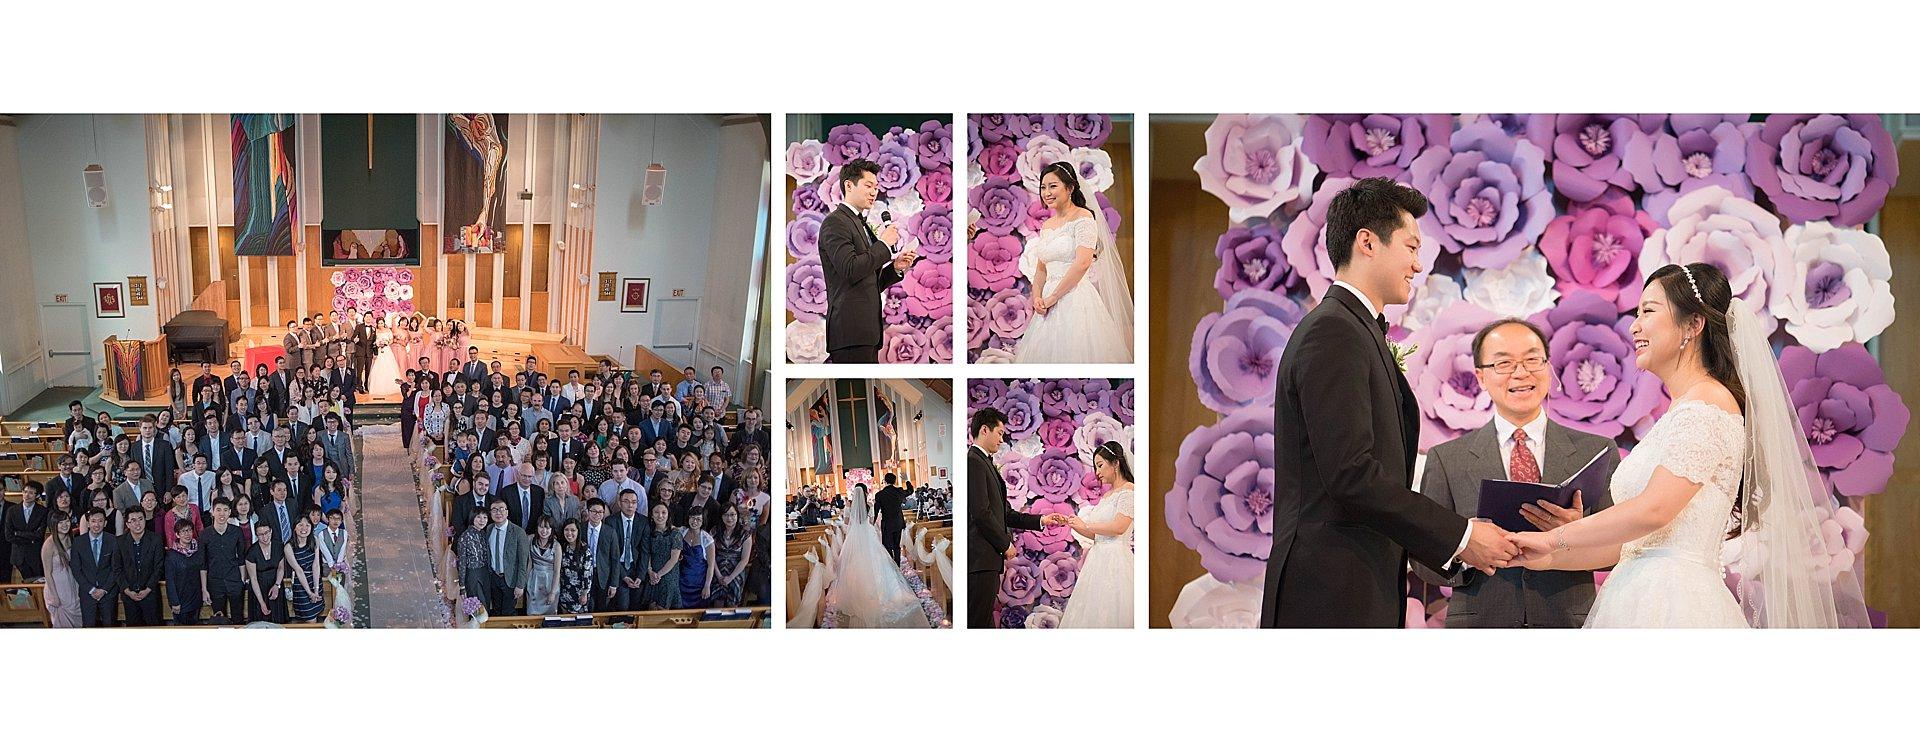 MB-First-Baptist-Church-Edmonton-Wedding-_0005